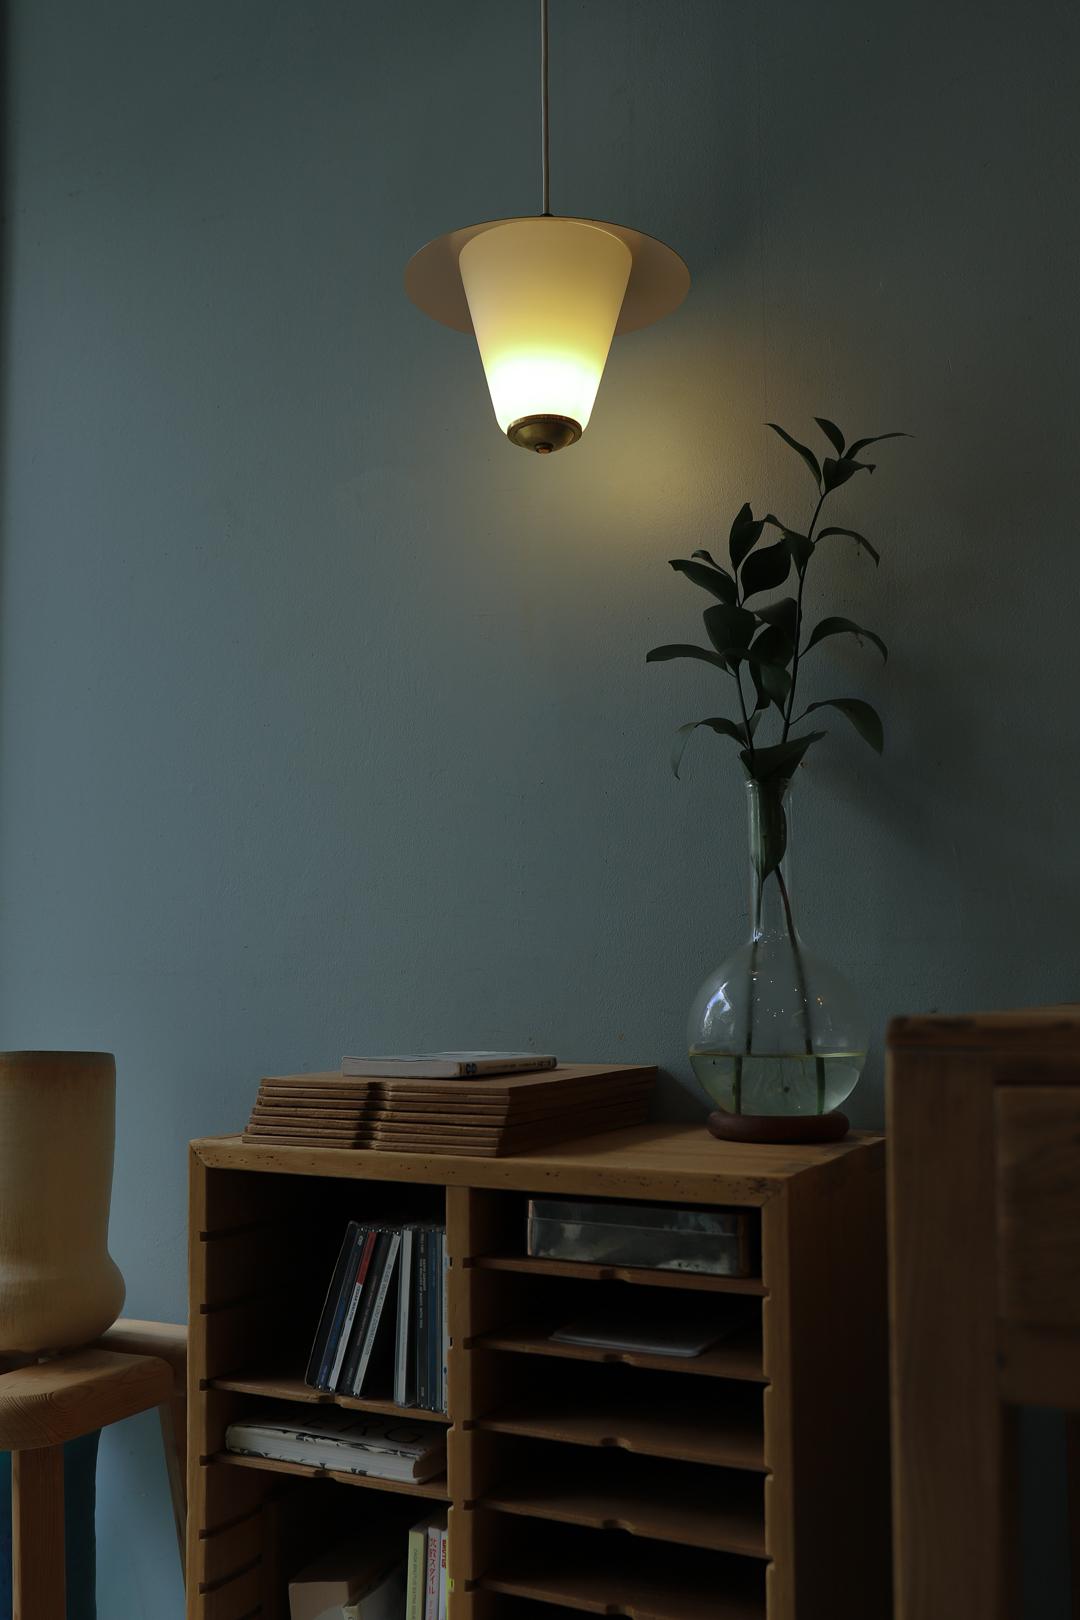 Danish Vintage Lyfa Pendant Light/デンマークヴィンテージ ライファ ペンダントライト 照明 北欧デザイン ミッドセンチュリー